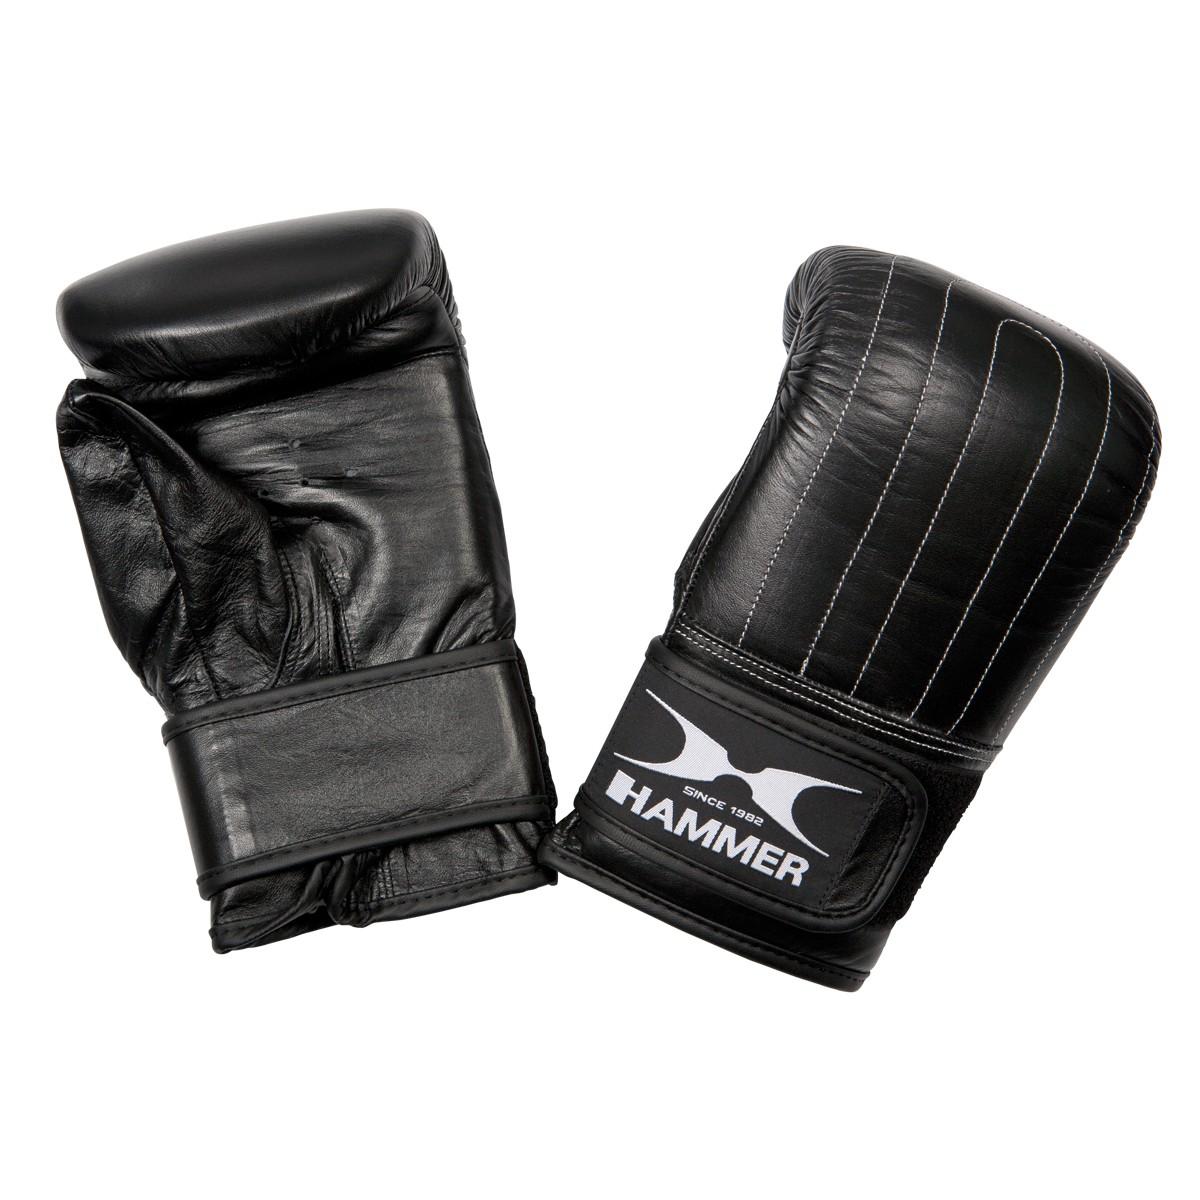 Buy HAMMER BOXING punching bag gloves PUNCH